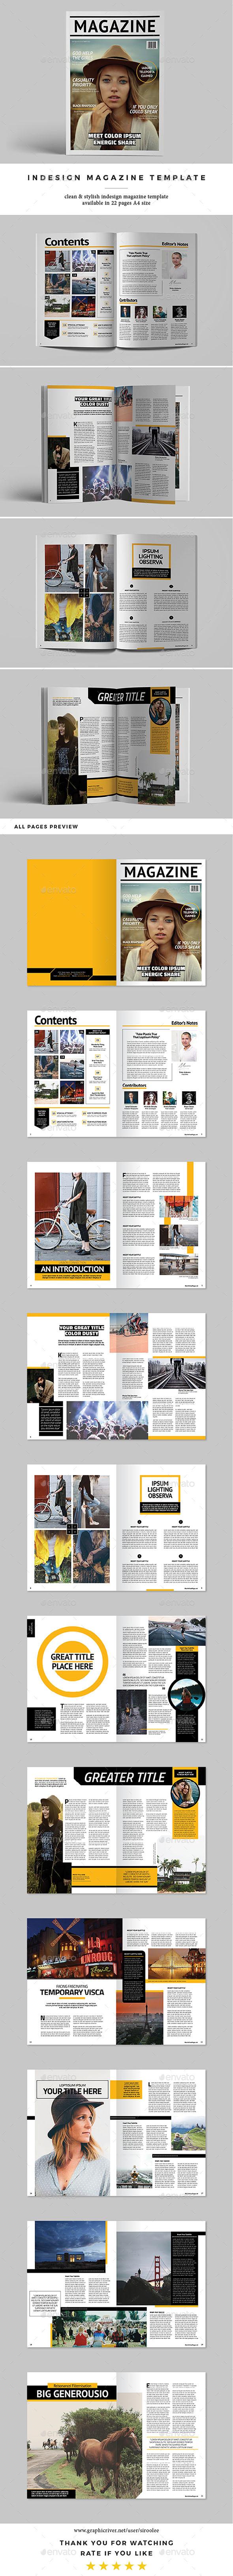 InDesign Magazine Template Vol.2 - Magazines Print Templates